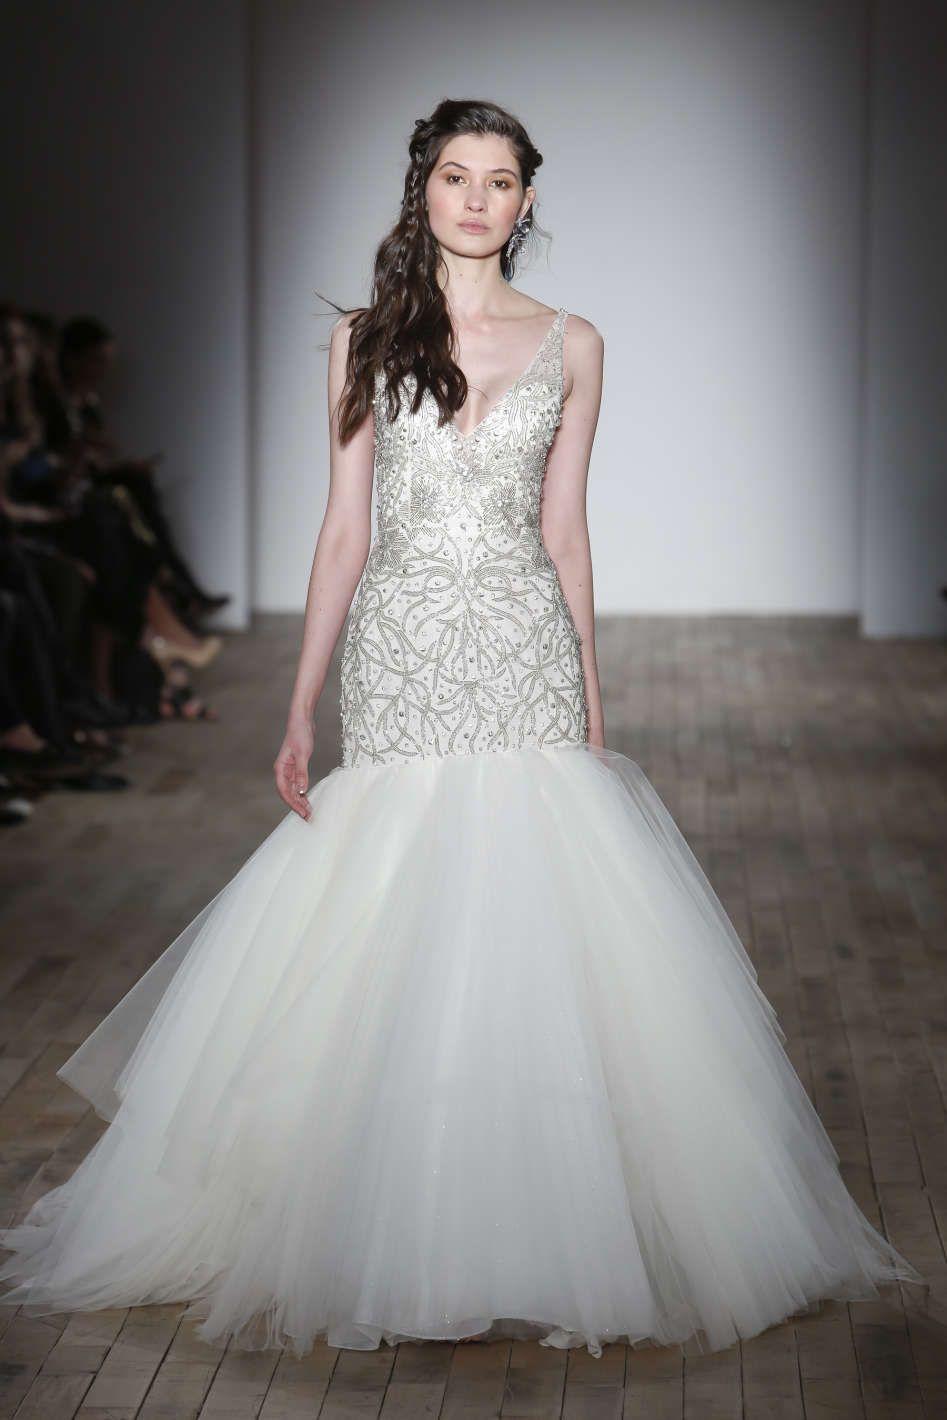 Wedding Dresses Las Vegas - Best Shapewear for Wedding Dress Check ...